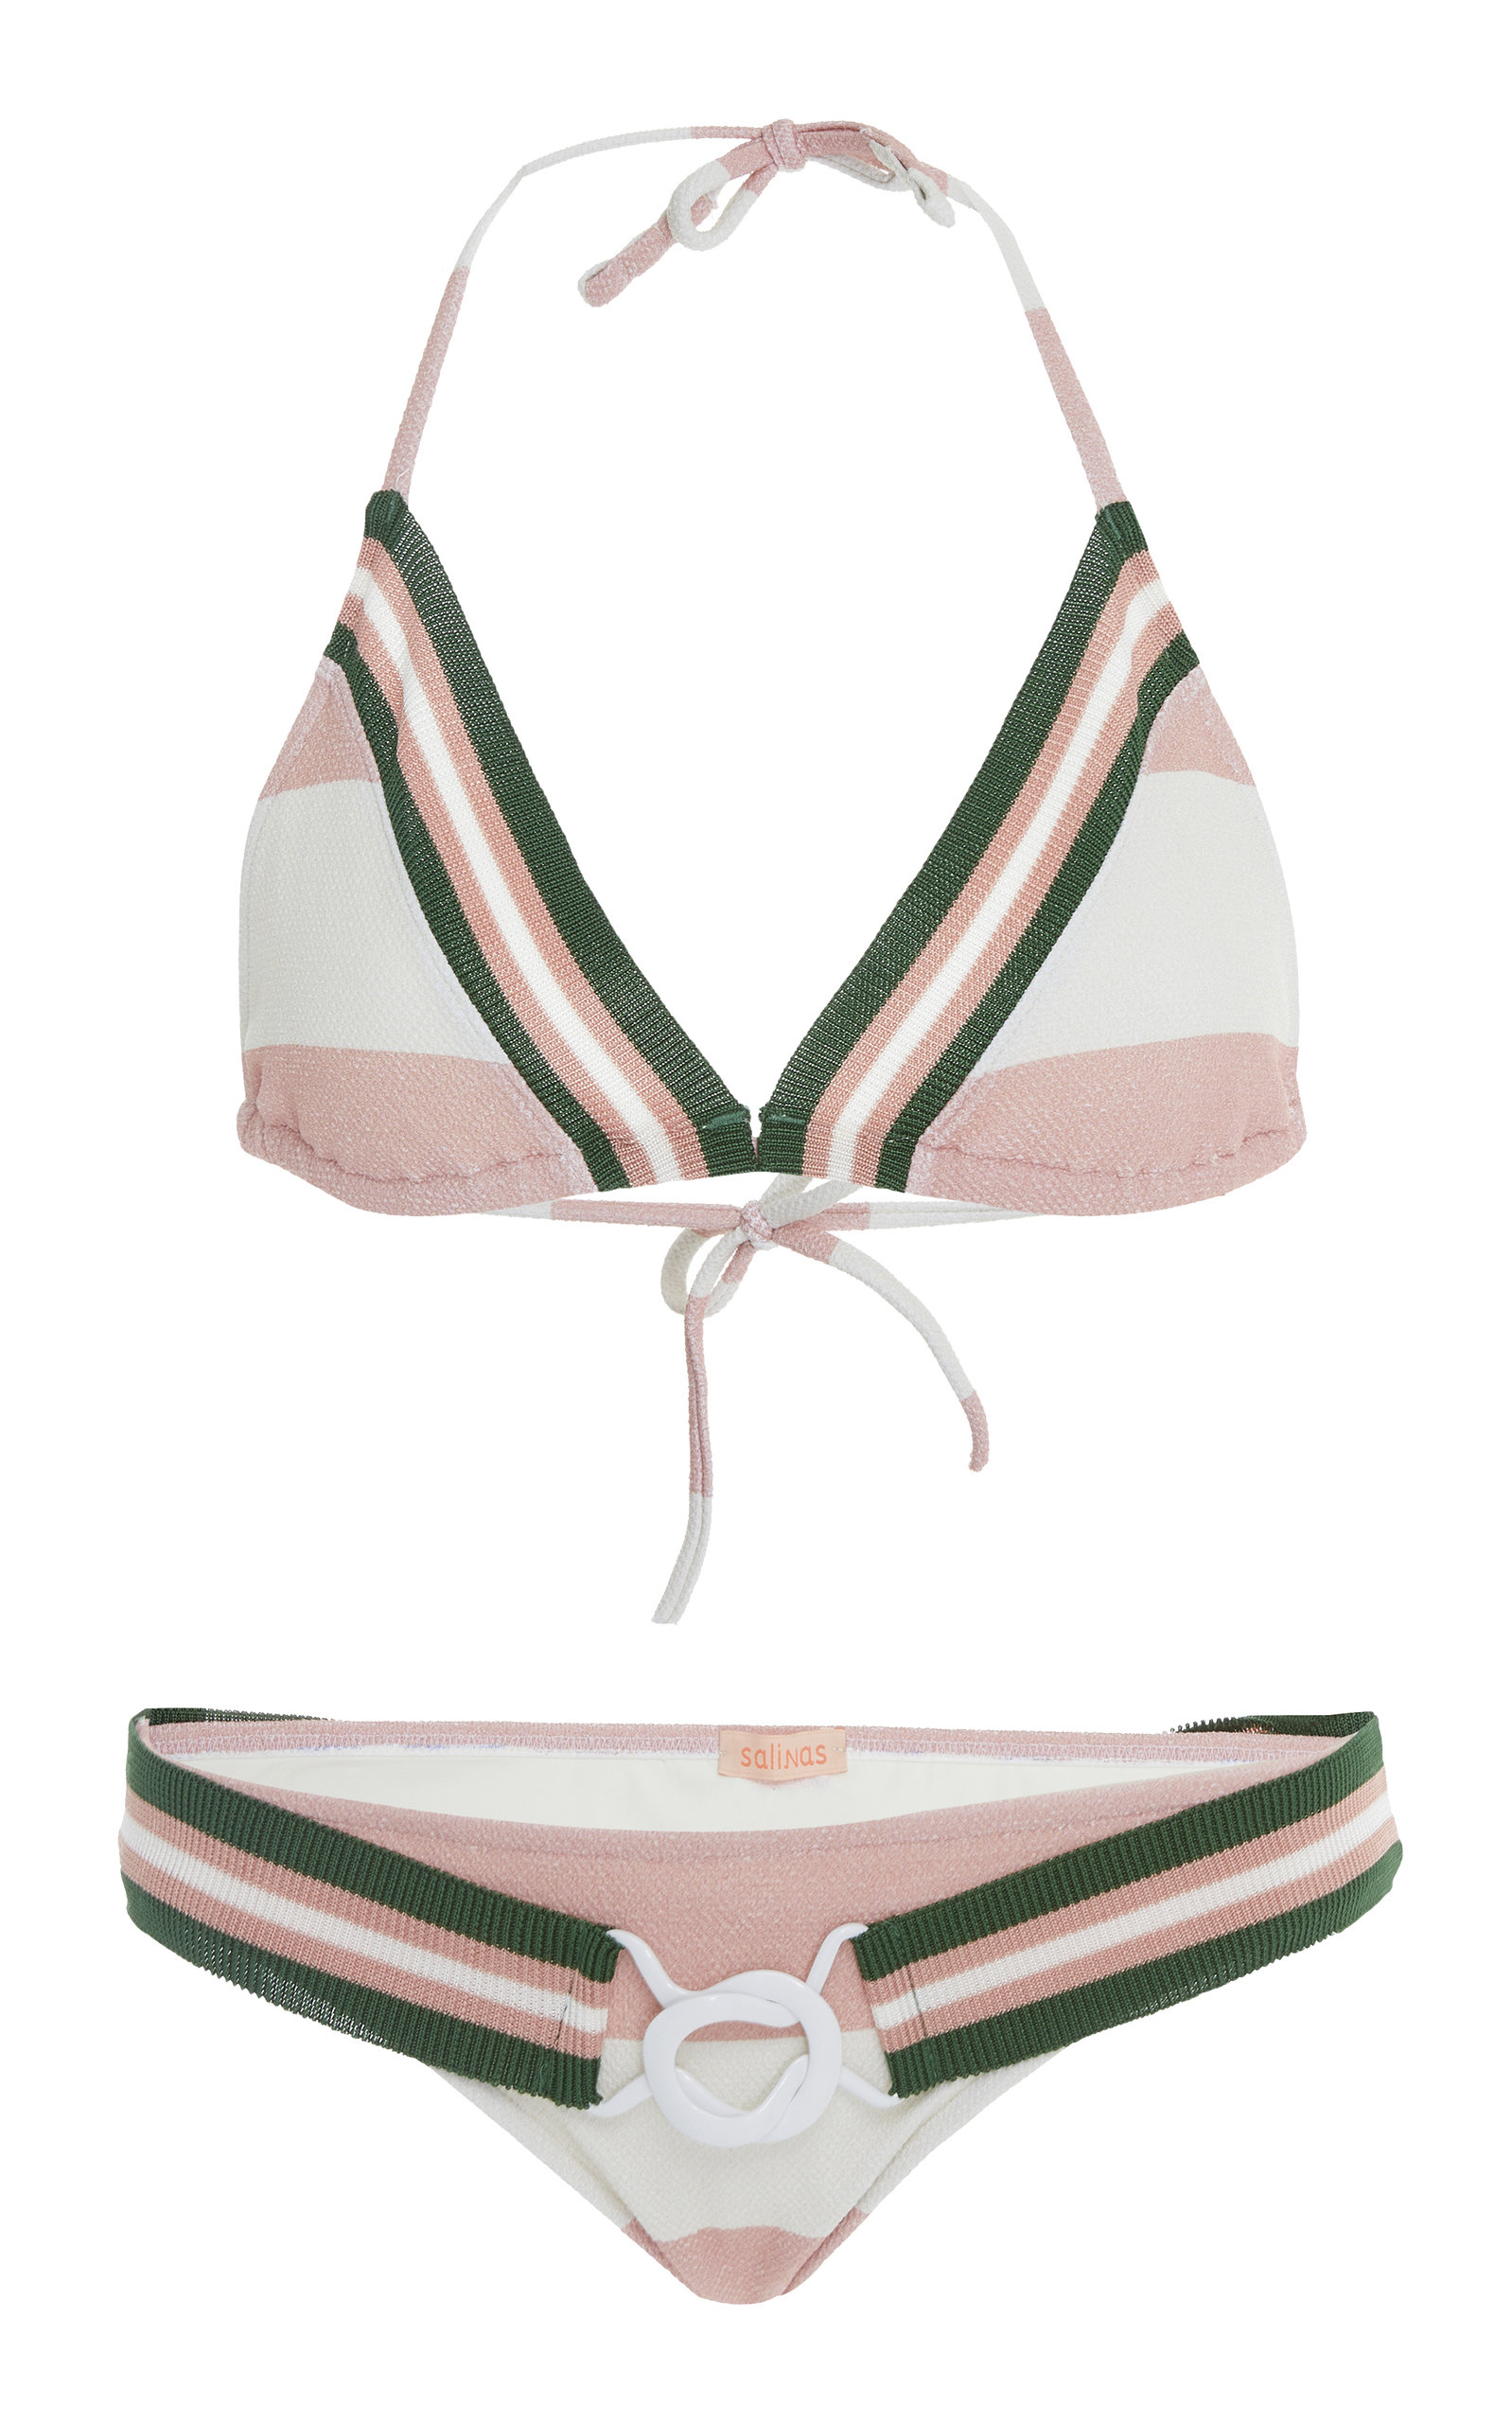 Salinas Garden Bikini Set Coût Vente En Ligne Recommander La Vente En Ligne QJ3Cqnlgd